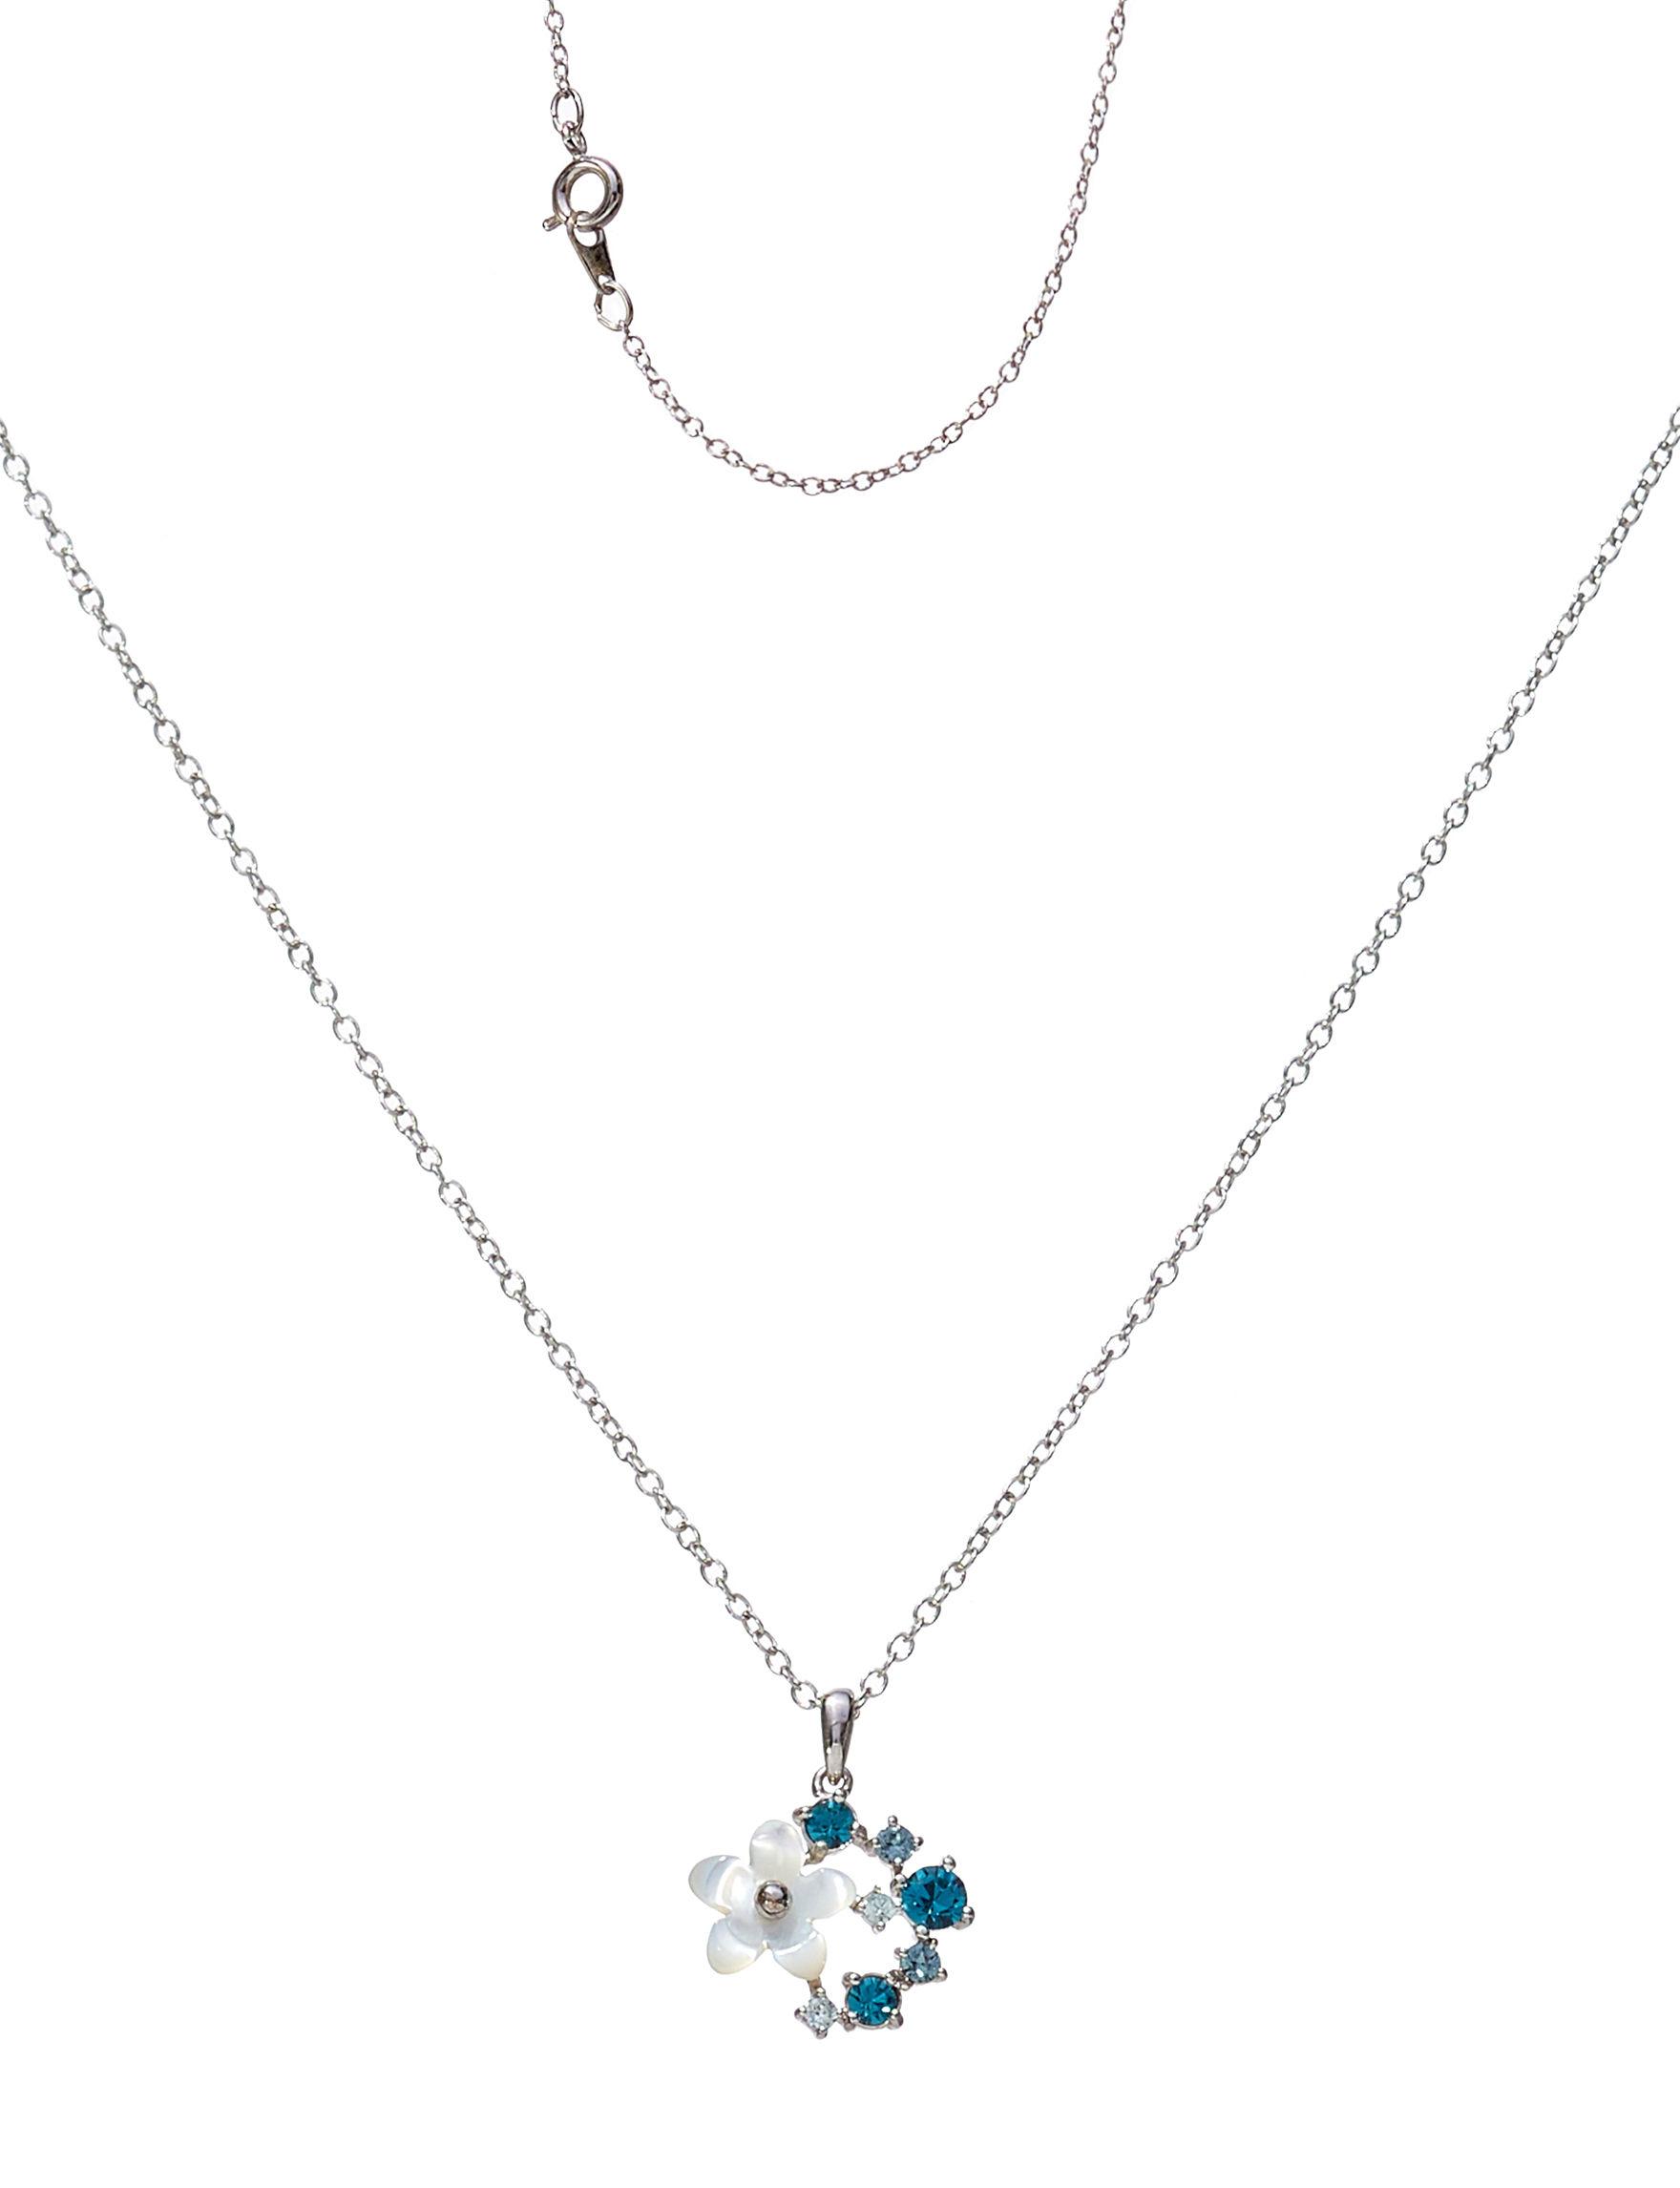 Sunstone Silver / Blue Necklaces & Pendants Fine Jewelry